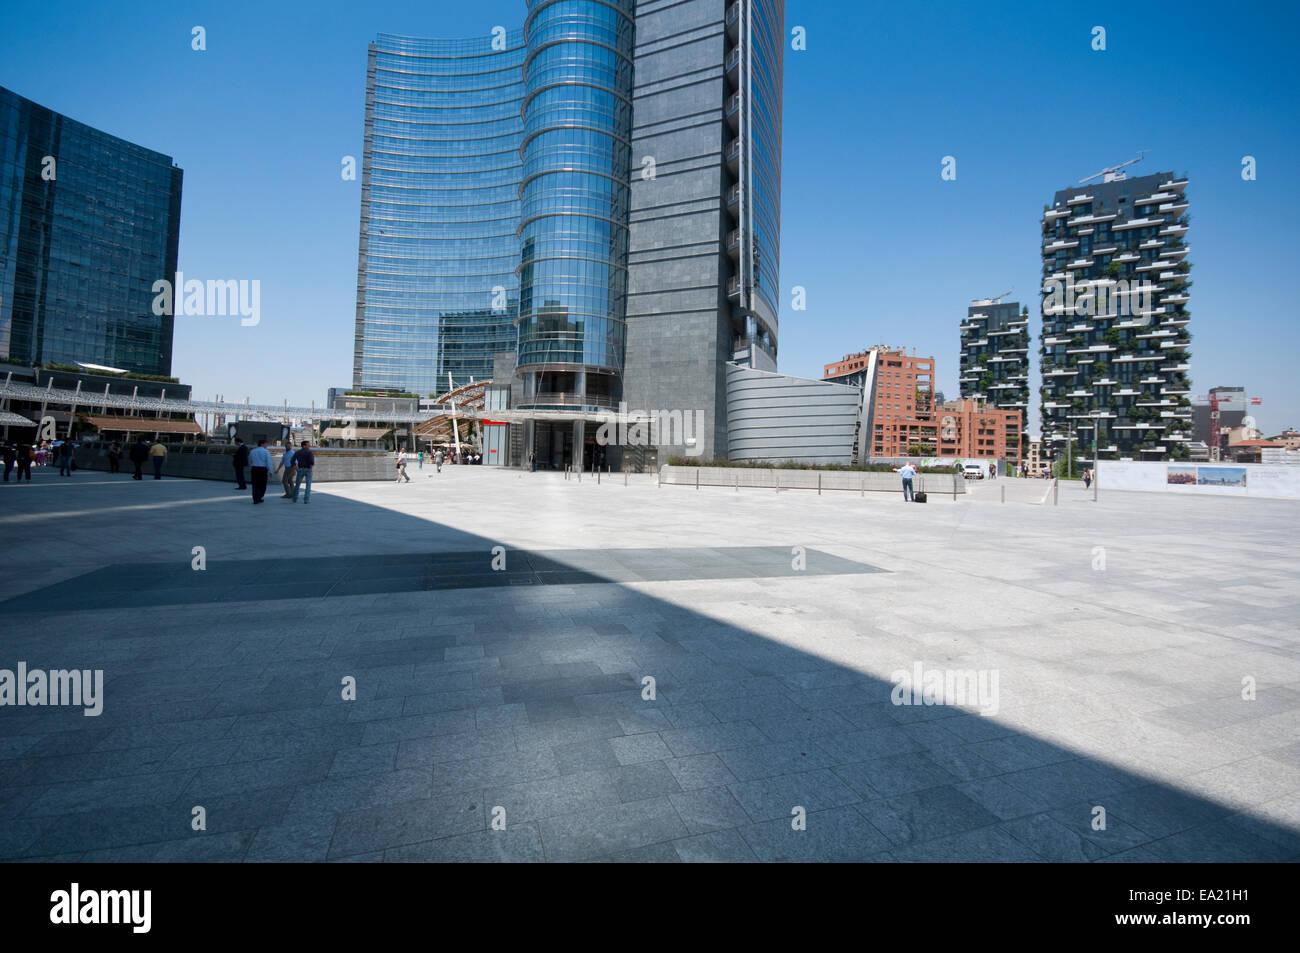 Italy, Lombardy, Milan, Gae Aulenti Square,  Porta Nuova Garibaldi Tower designed by Cesar Pelli. Stock Photo